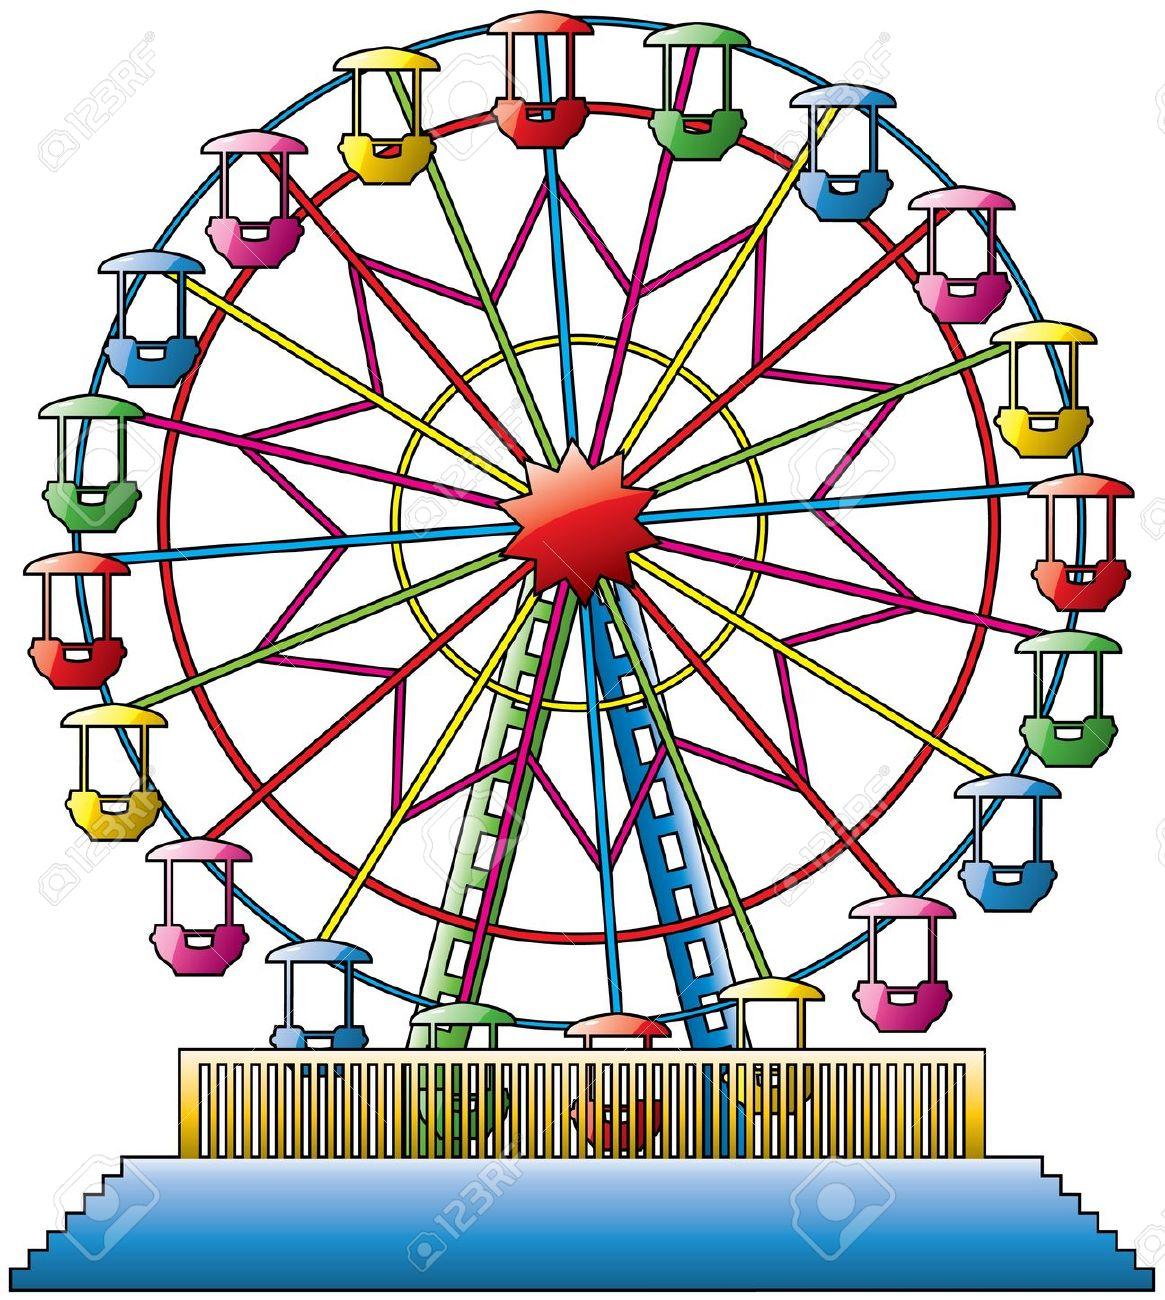 Ferris Wheel clipart giant wheel Clip Cliparts Wheel Art Download